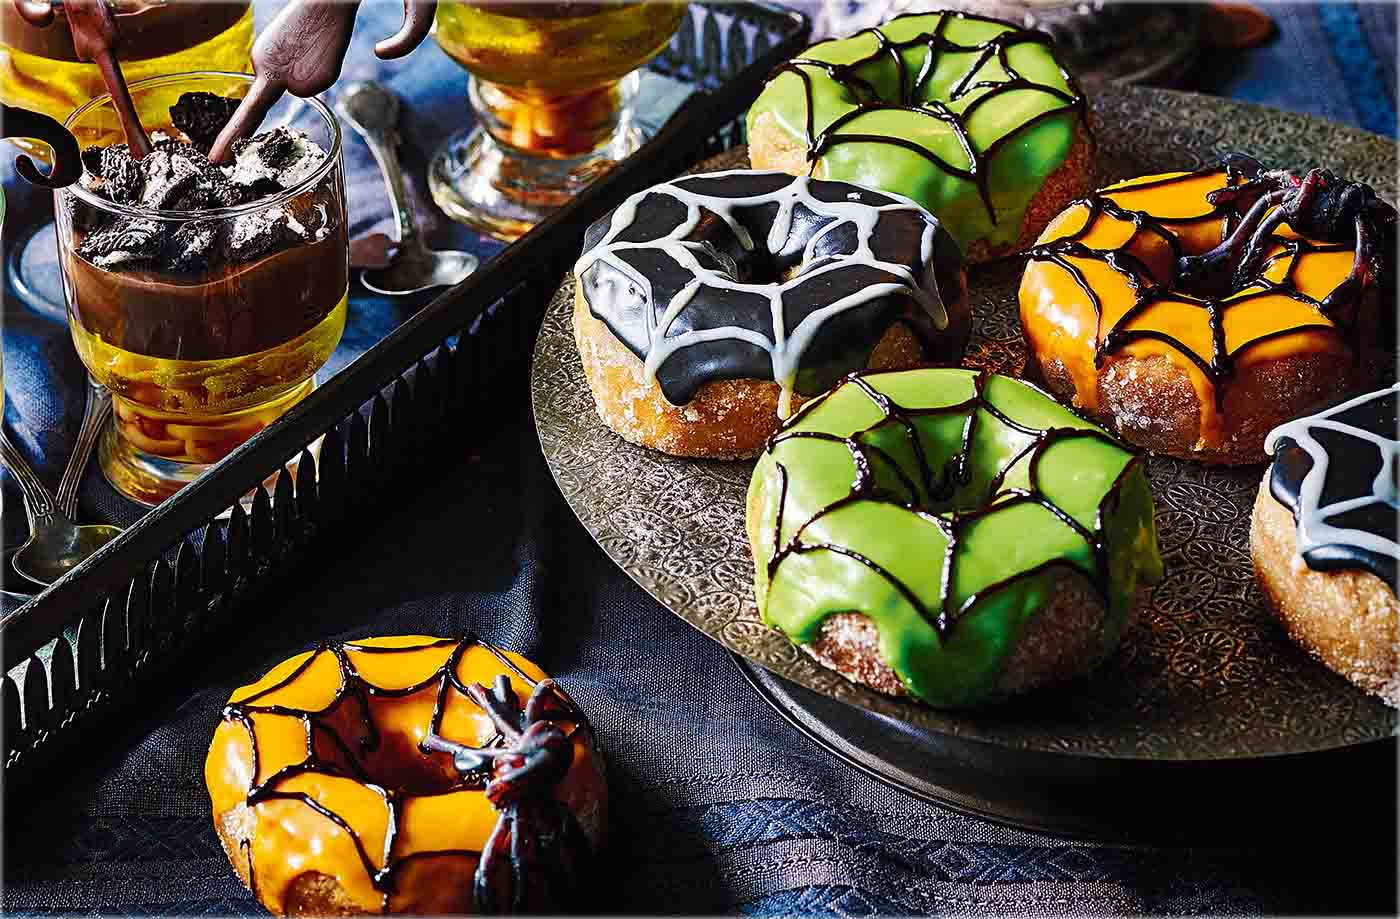 spiderweb doughnuts recipe | halloween party food ideas | tesco real